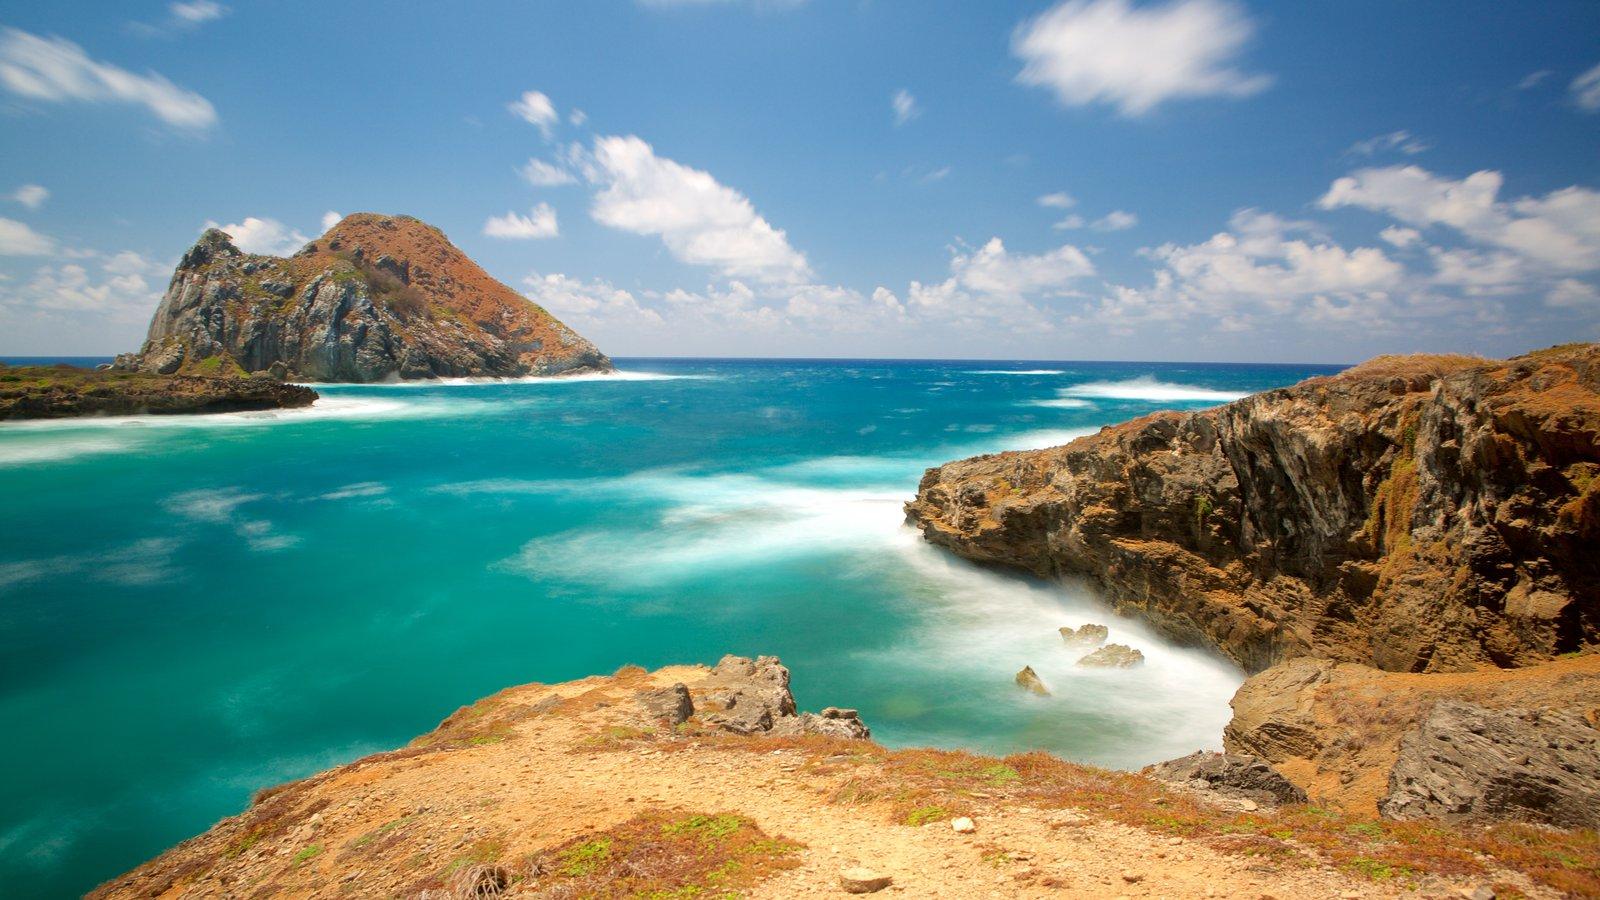 Fernando de Noronha caracterizando paisagem e litoral rochoso